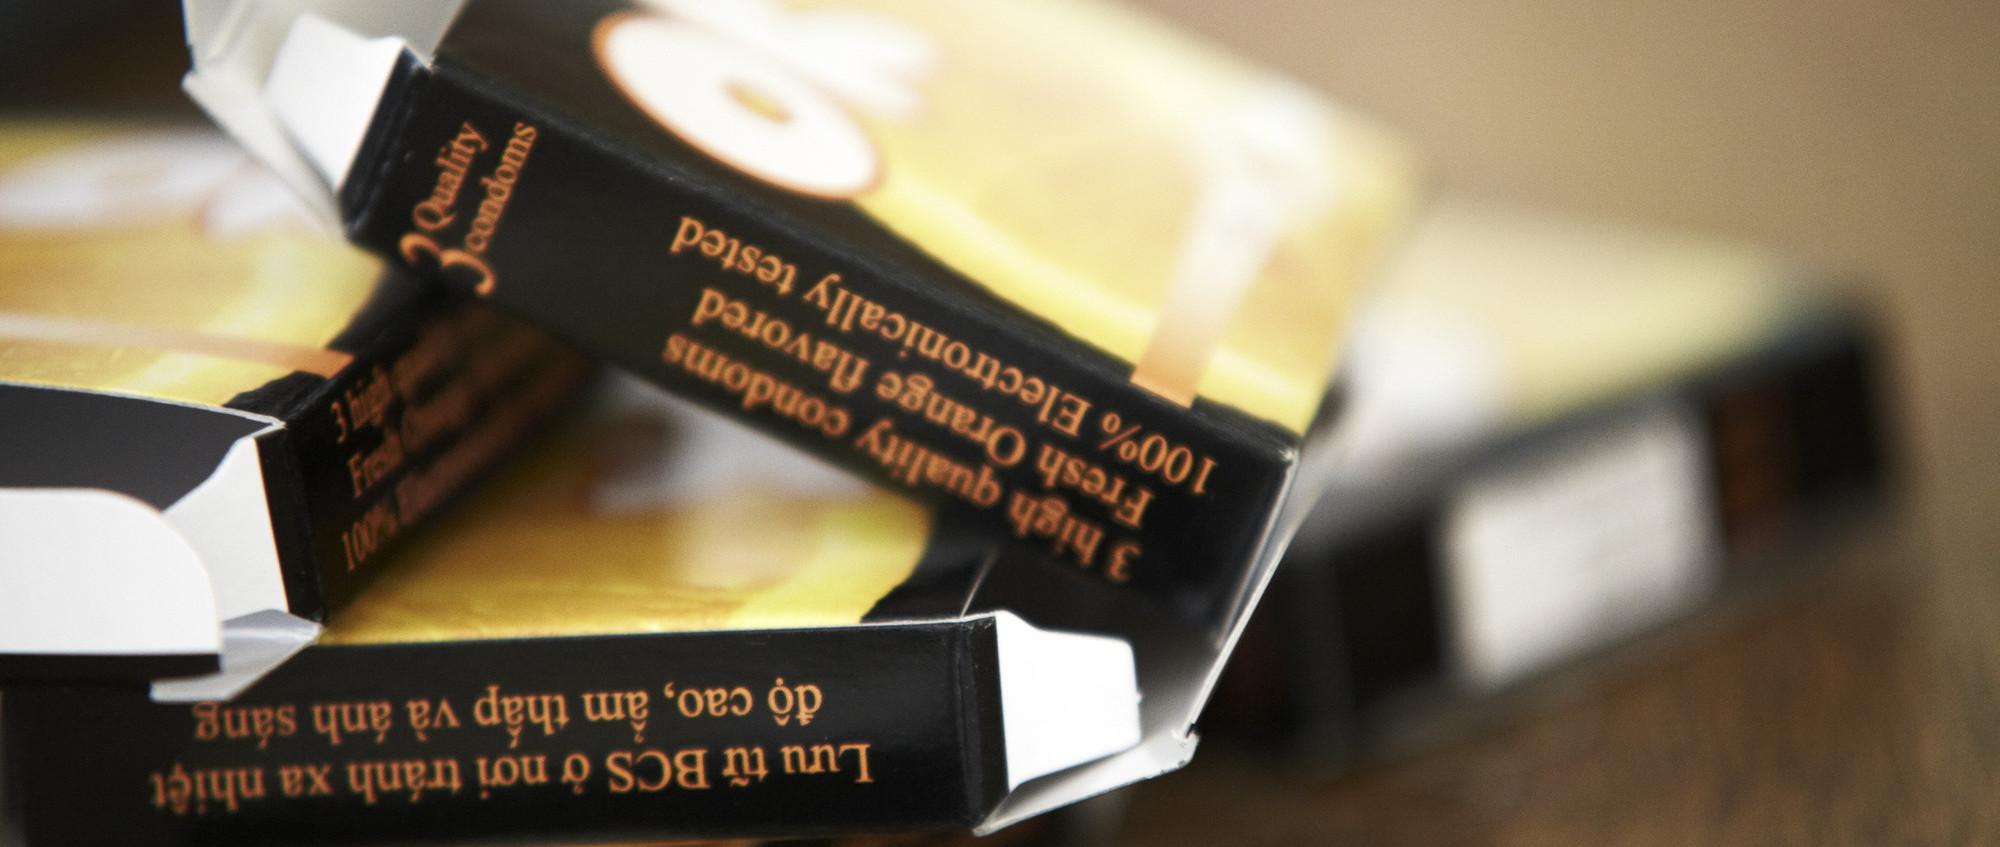 Box of condoms distributed in Vietnam